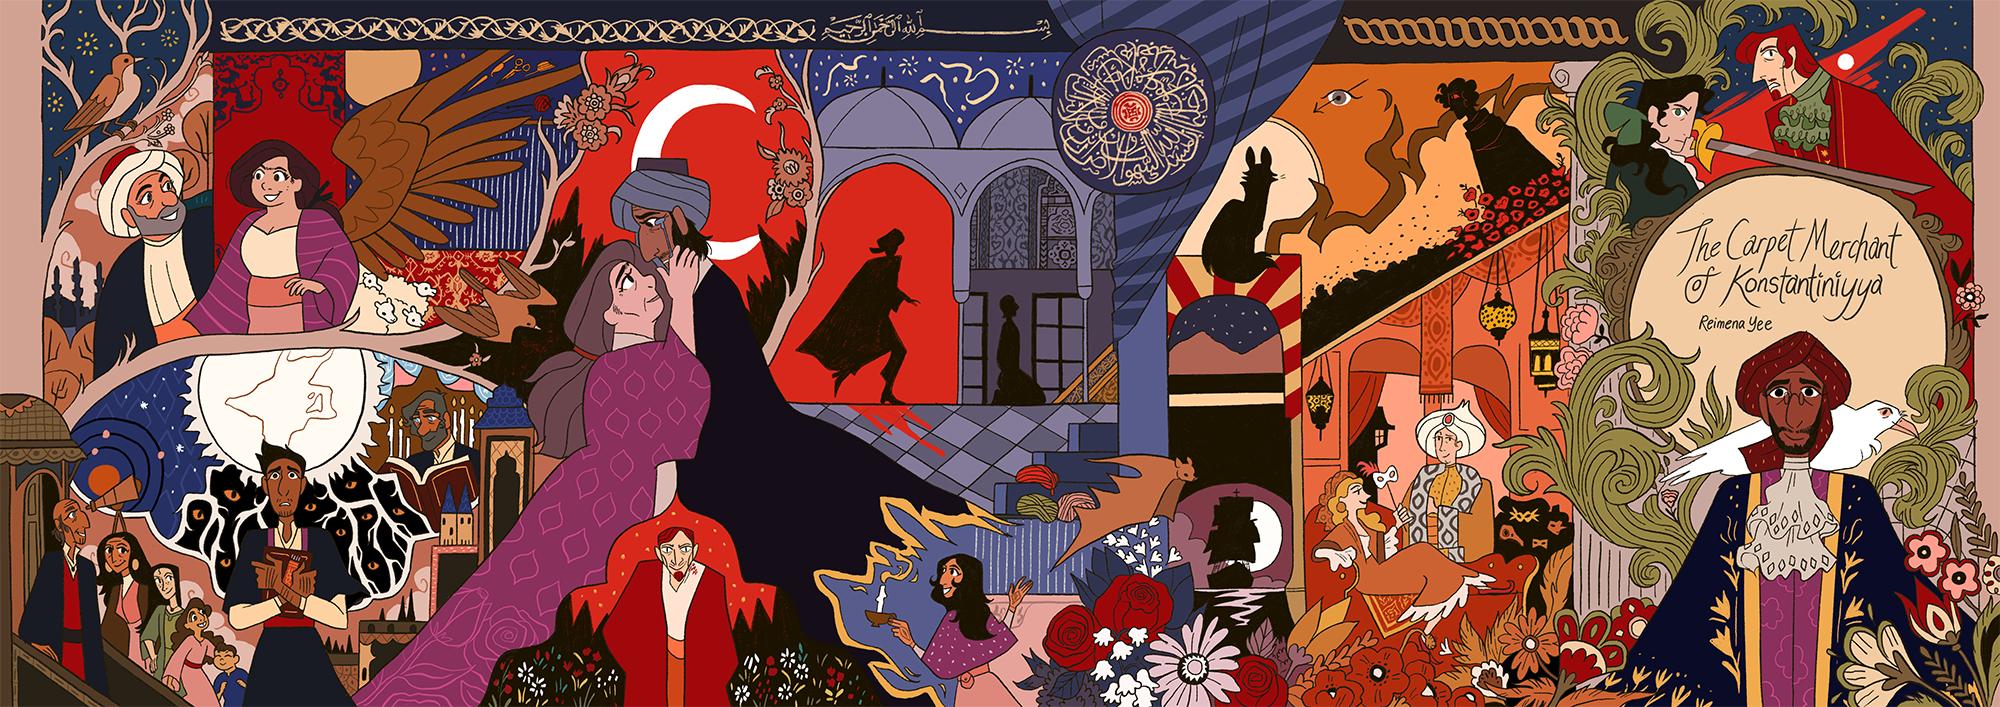 The Carpet Merchant of Konstantiniyya: Vol II 1st Ed